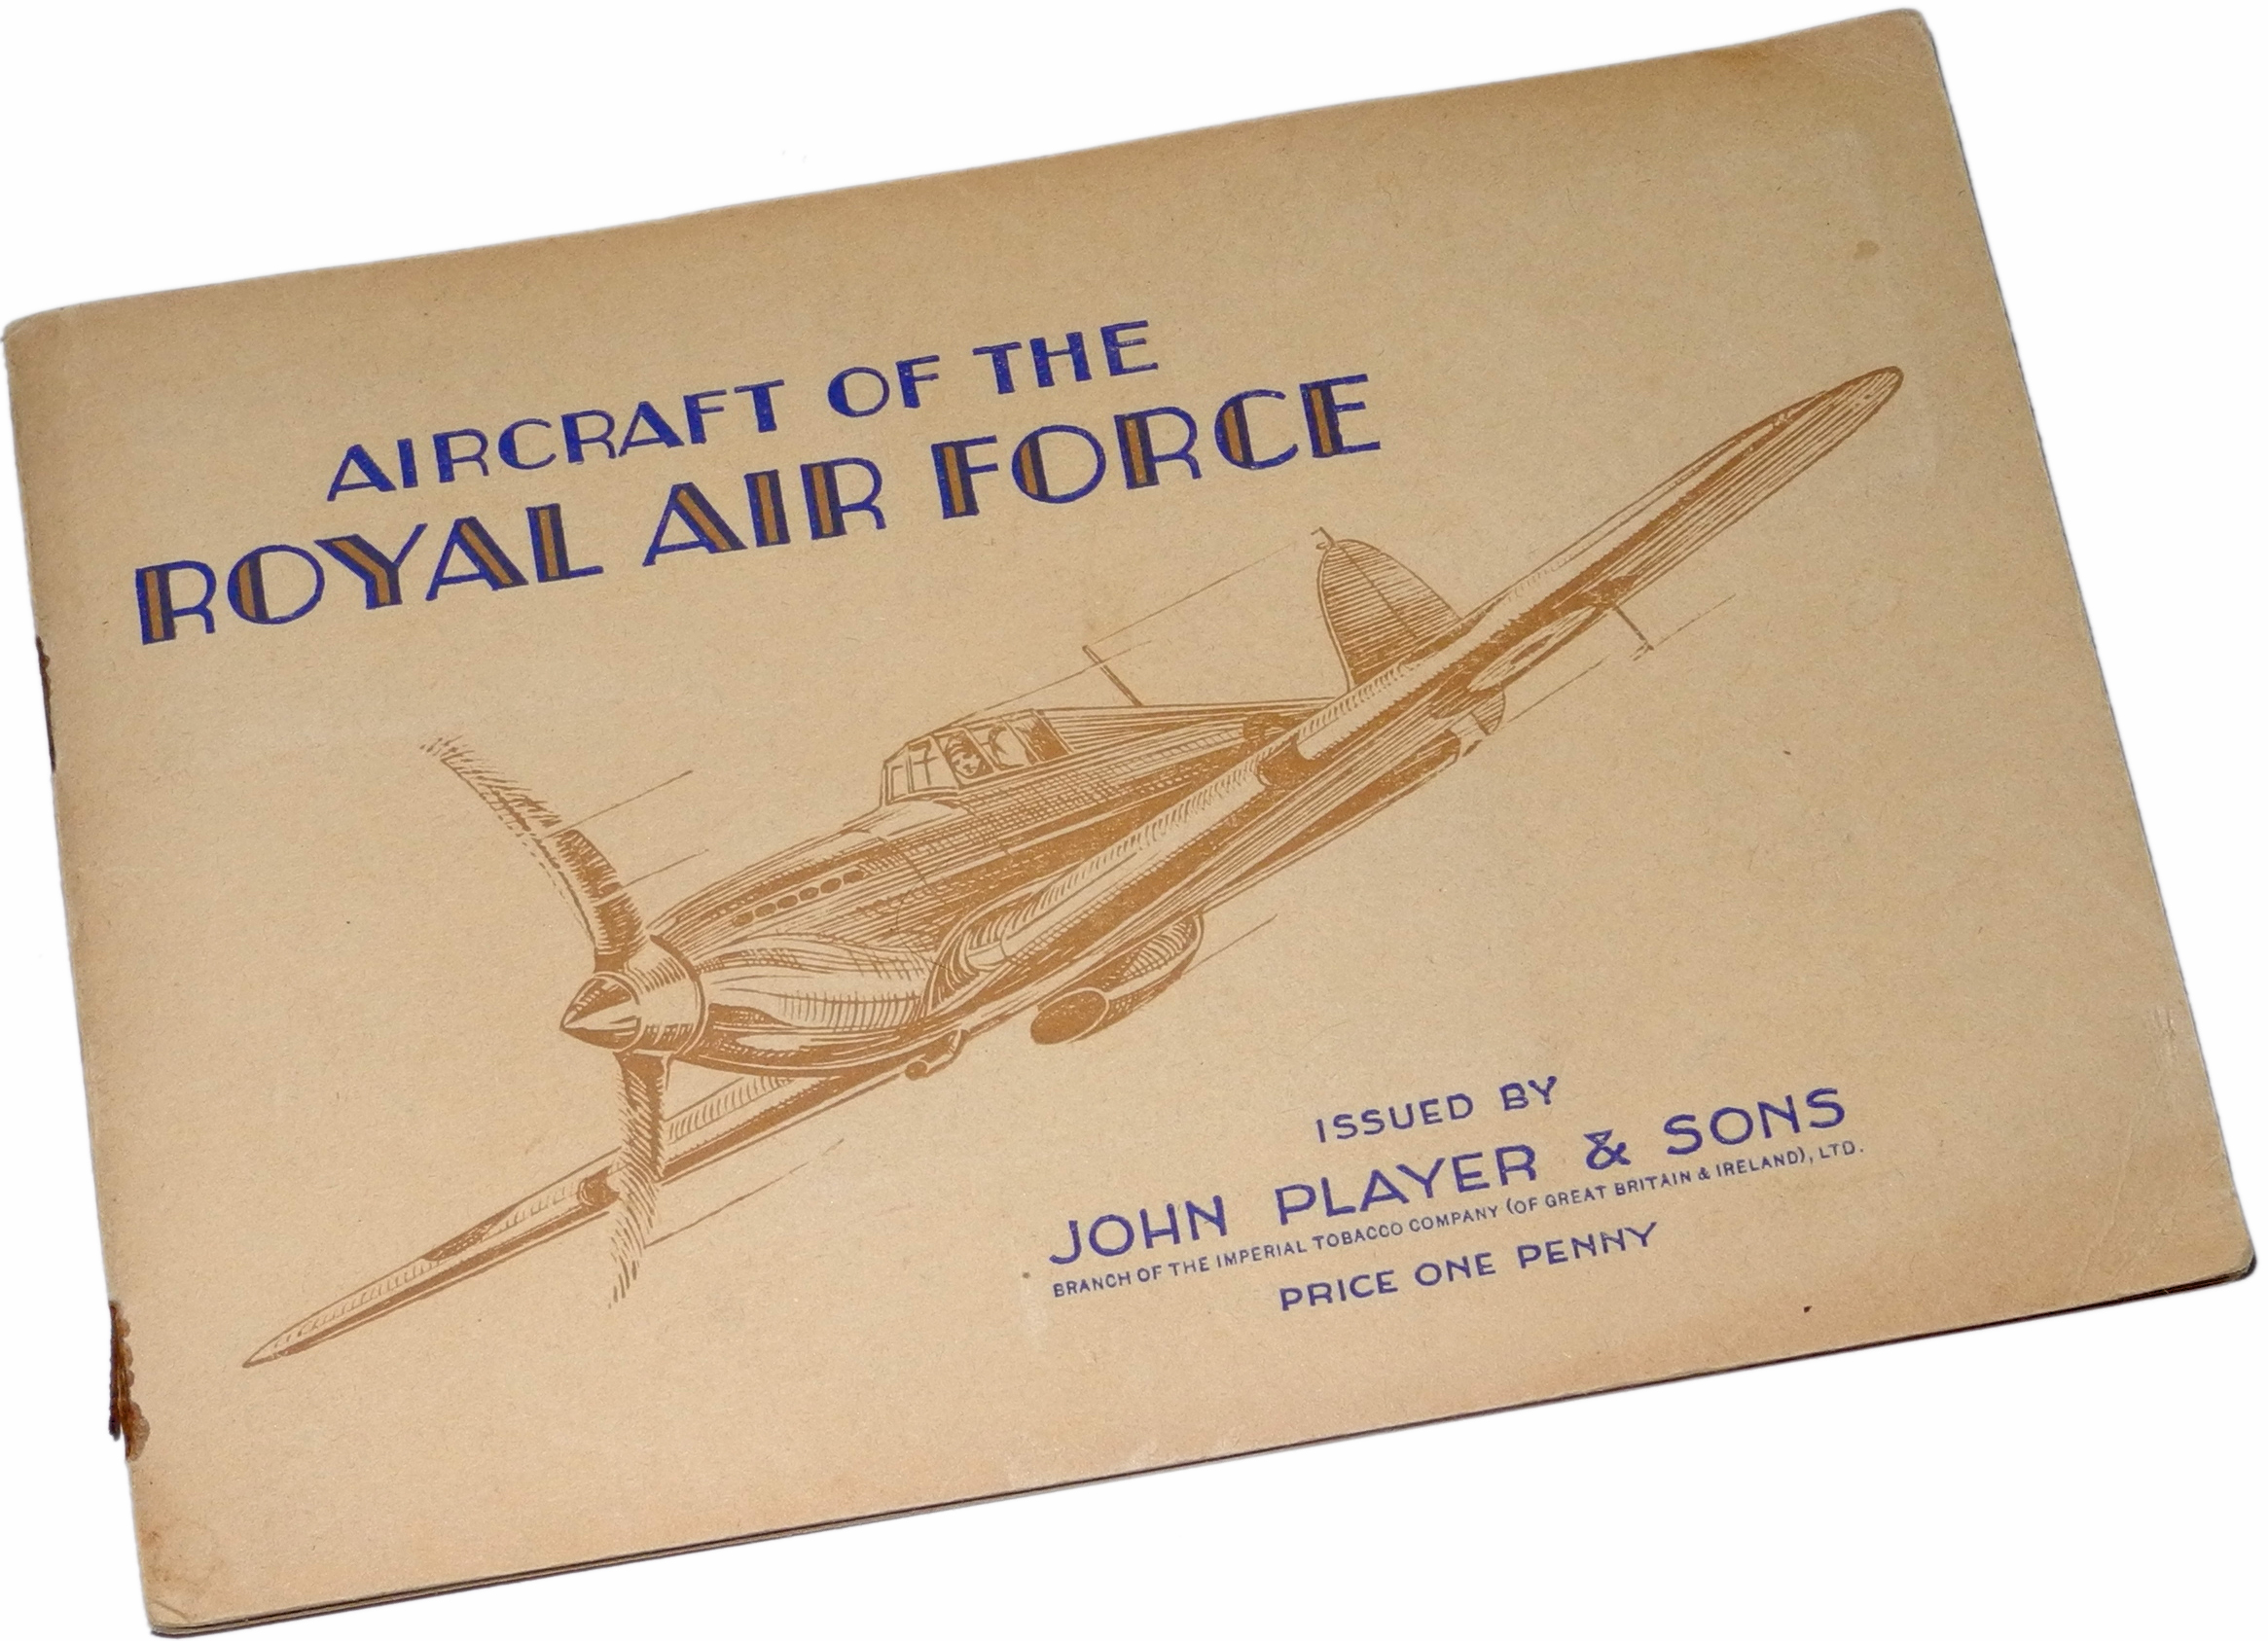 PLayers cigarette cards + album RAF